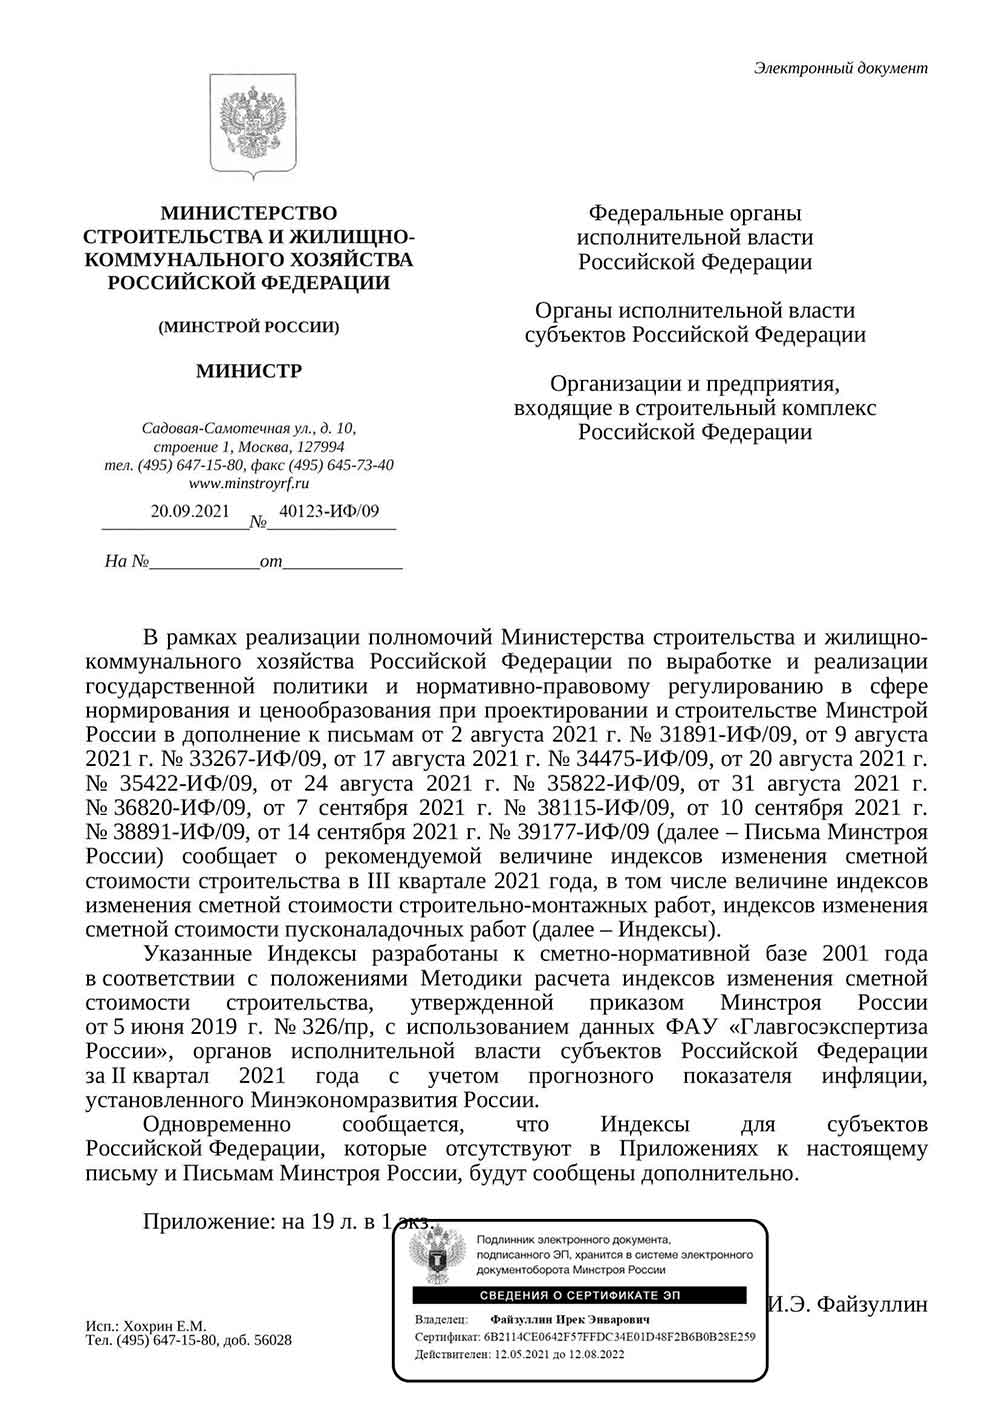 Письмо Минстроя РФ №40123-ИФ/09 от 20.09.2021 г.